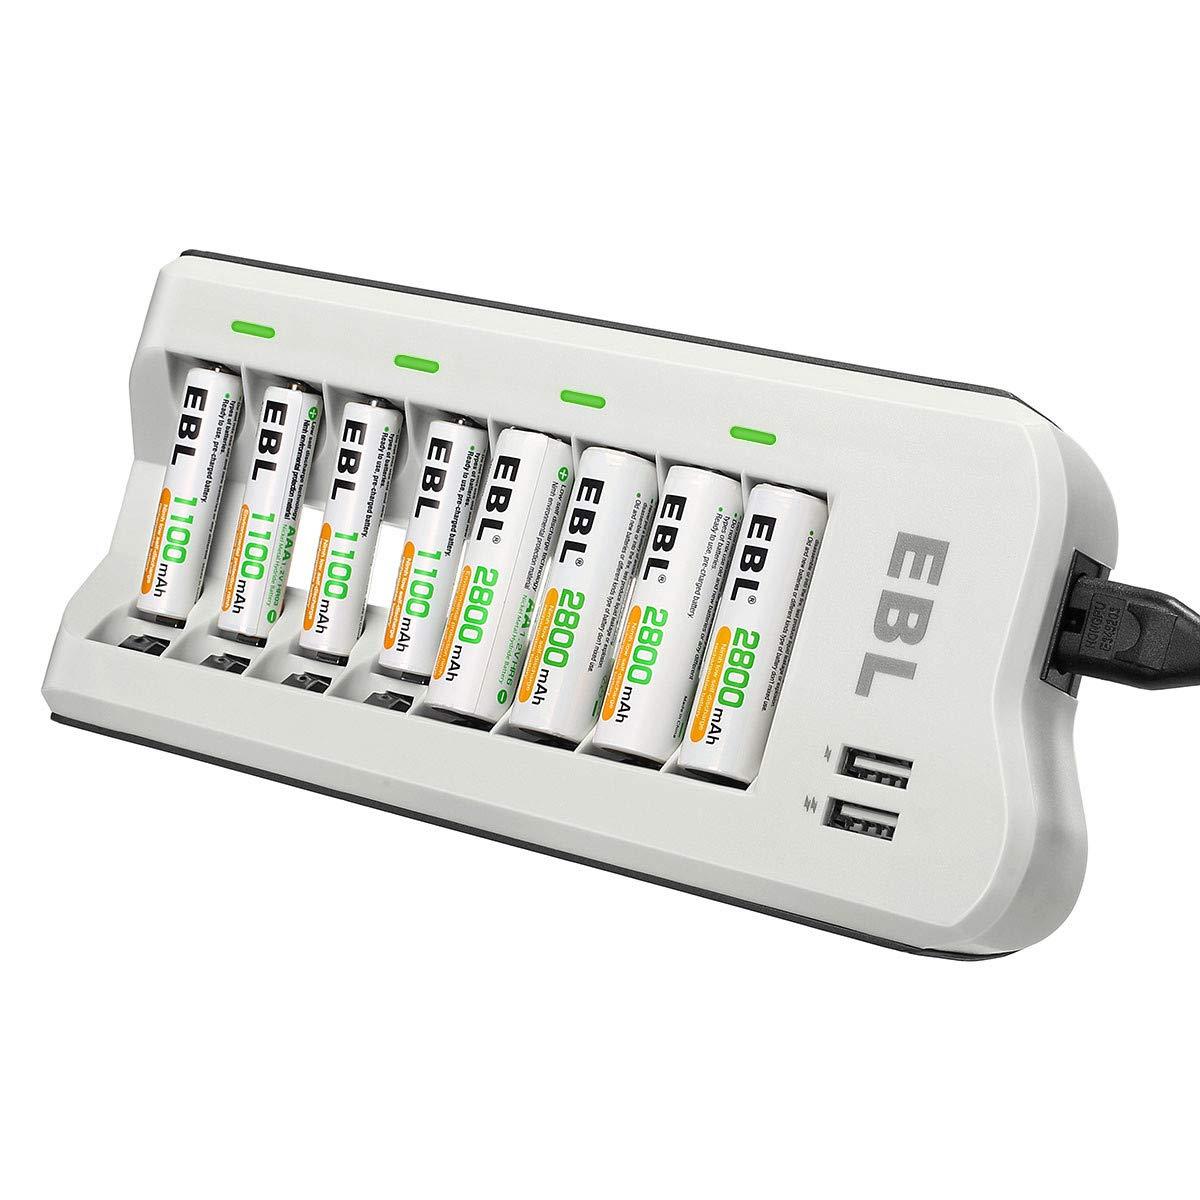 EBL Akkuladegerät 8 Stecker mit 2 USB Port für AA AAA NI-MH Akku inkl. Batterien ladegerät mit 4*AA 2800mAh und 4*AAA Akkus1100mAh